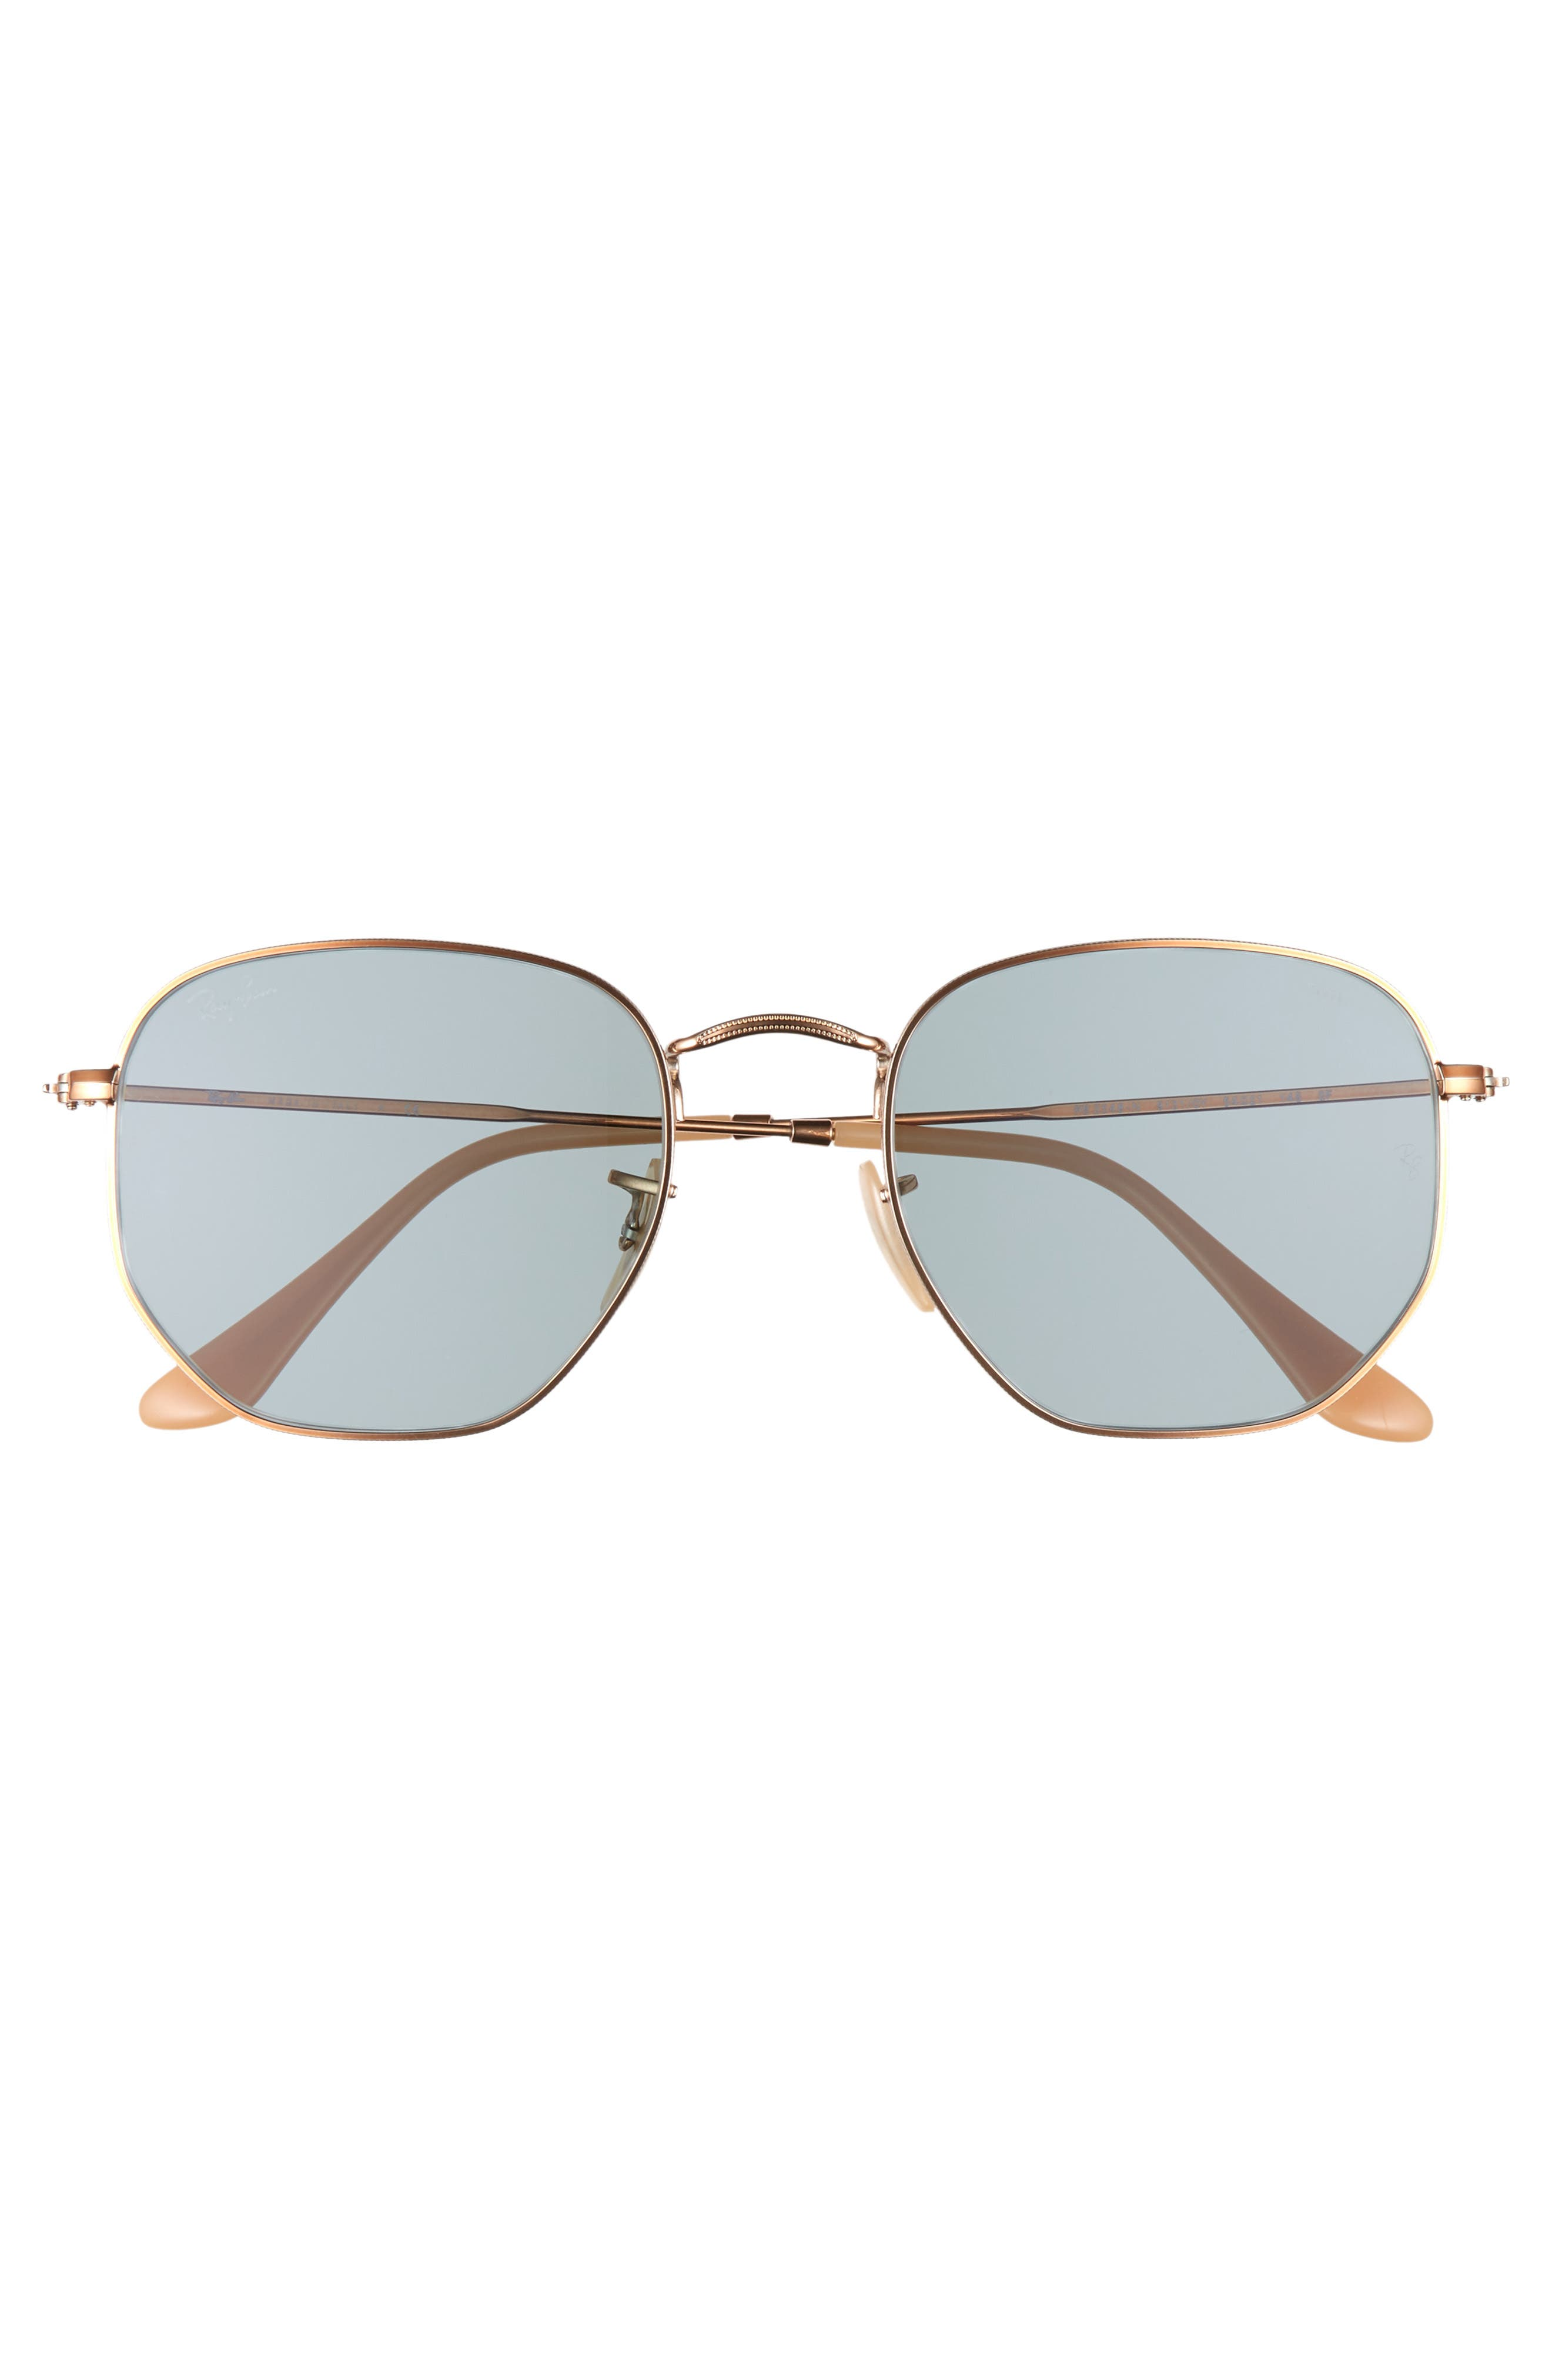 RAY-BAN, 54mm Evolve Photochromic Hexagon Sunglasses, Alternate thumbnail 3, color, GOLD/ LIGHT BLUE SOLID